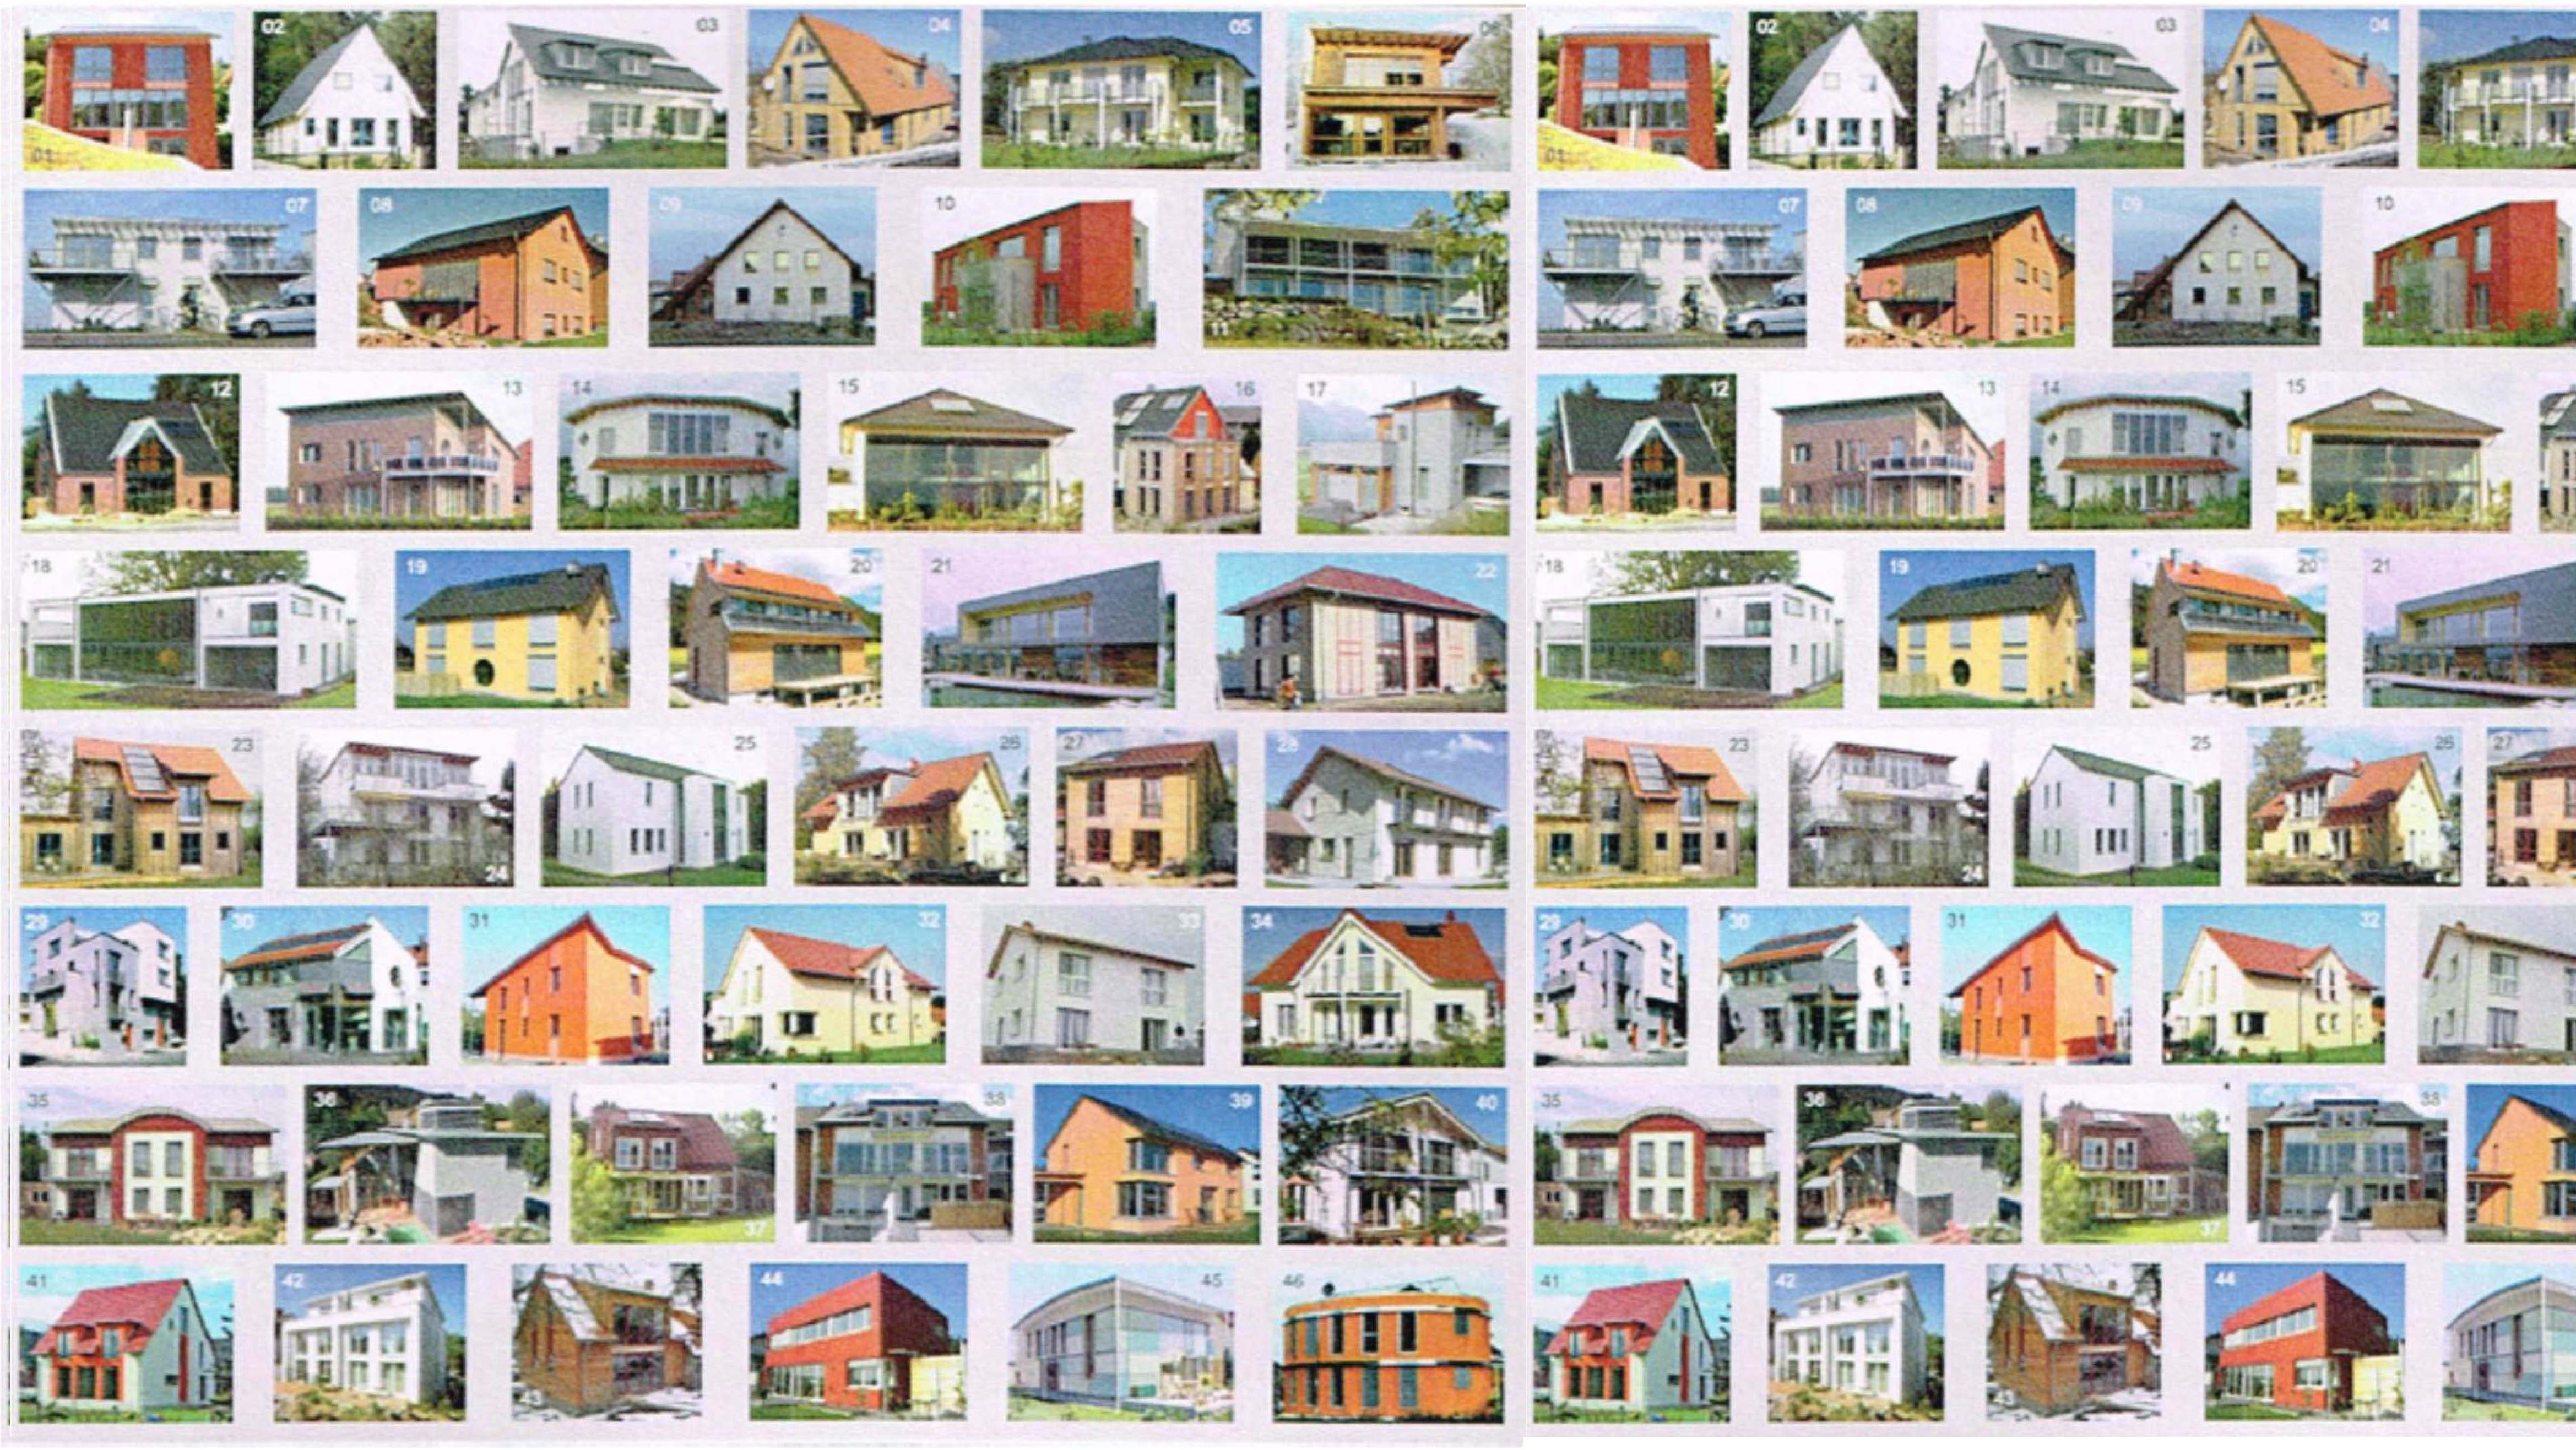 passivhaus-tiberio-tipologia-case-edifici